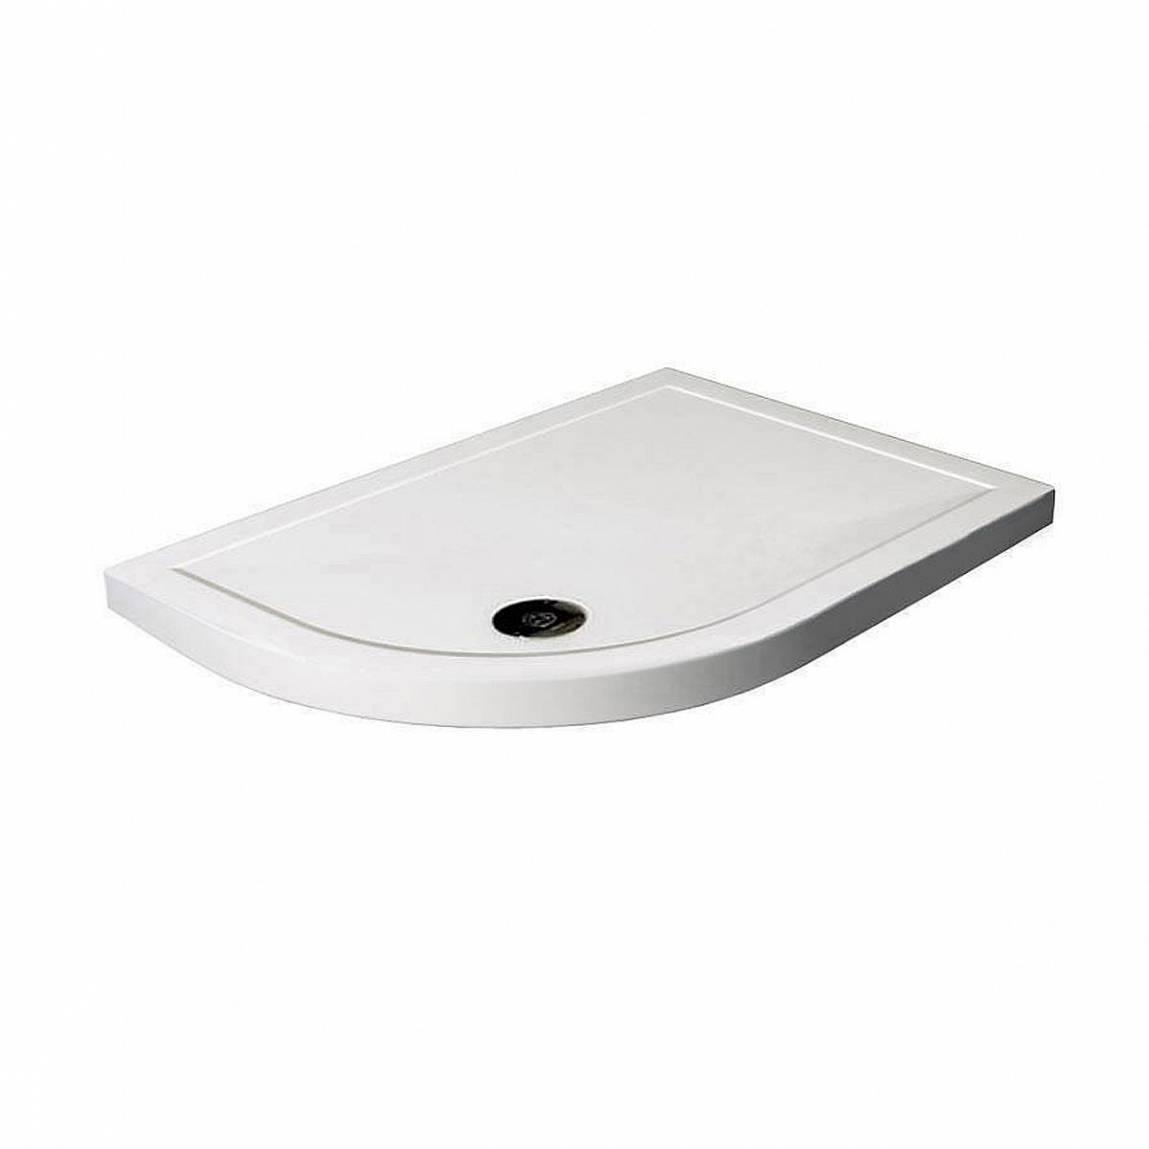 Image of Offset Quadrant Stone Shower Tray 1000 x 800 LH